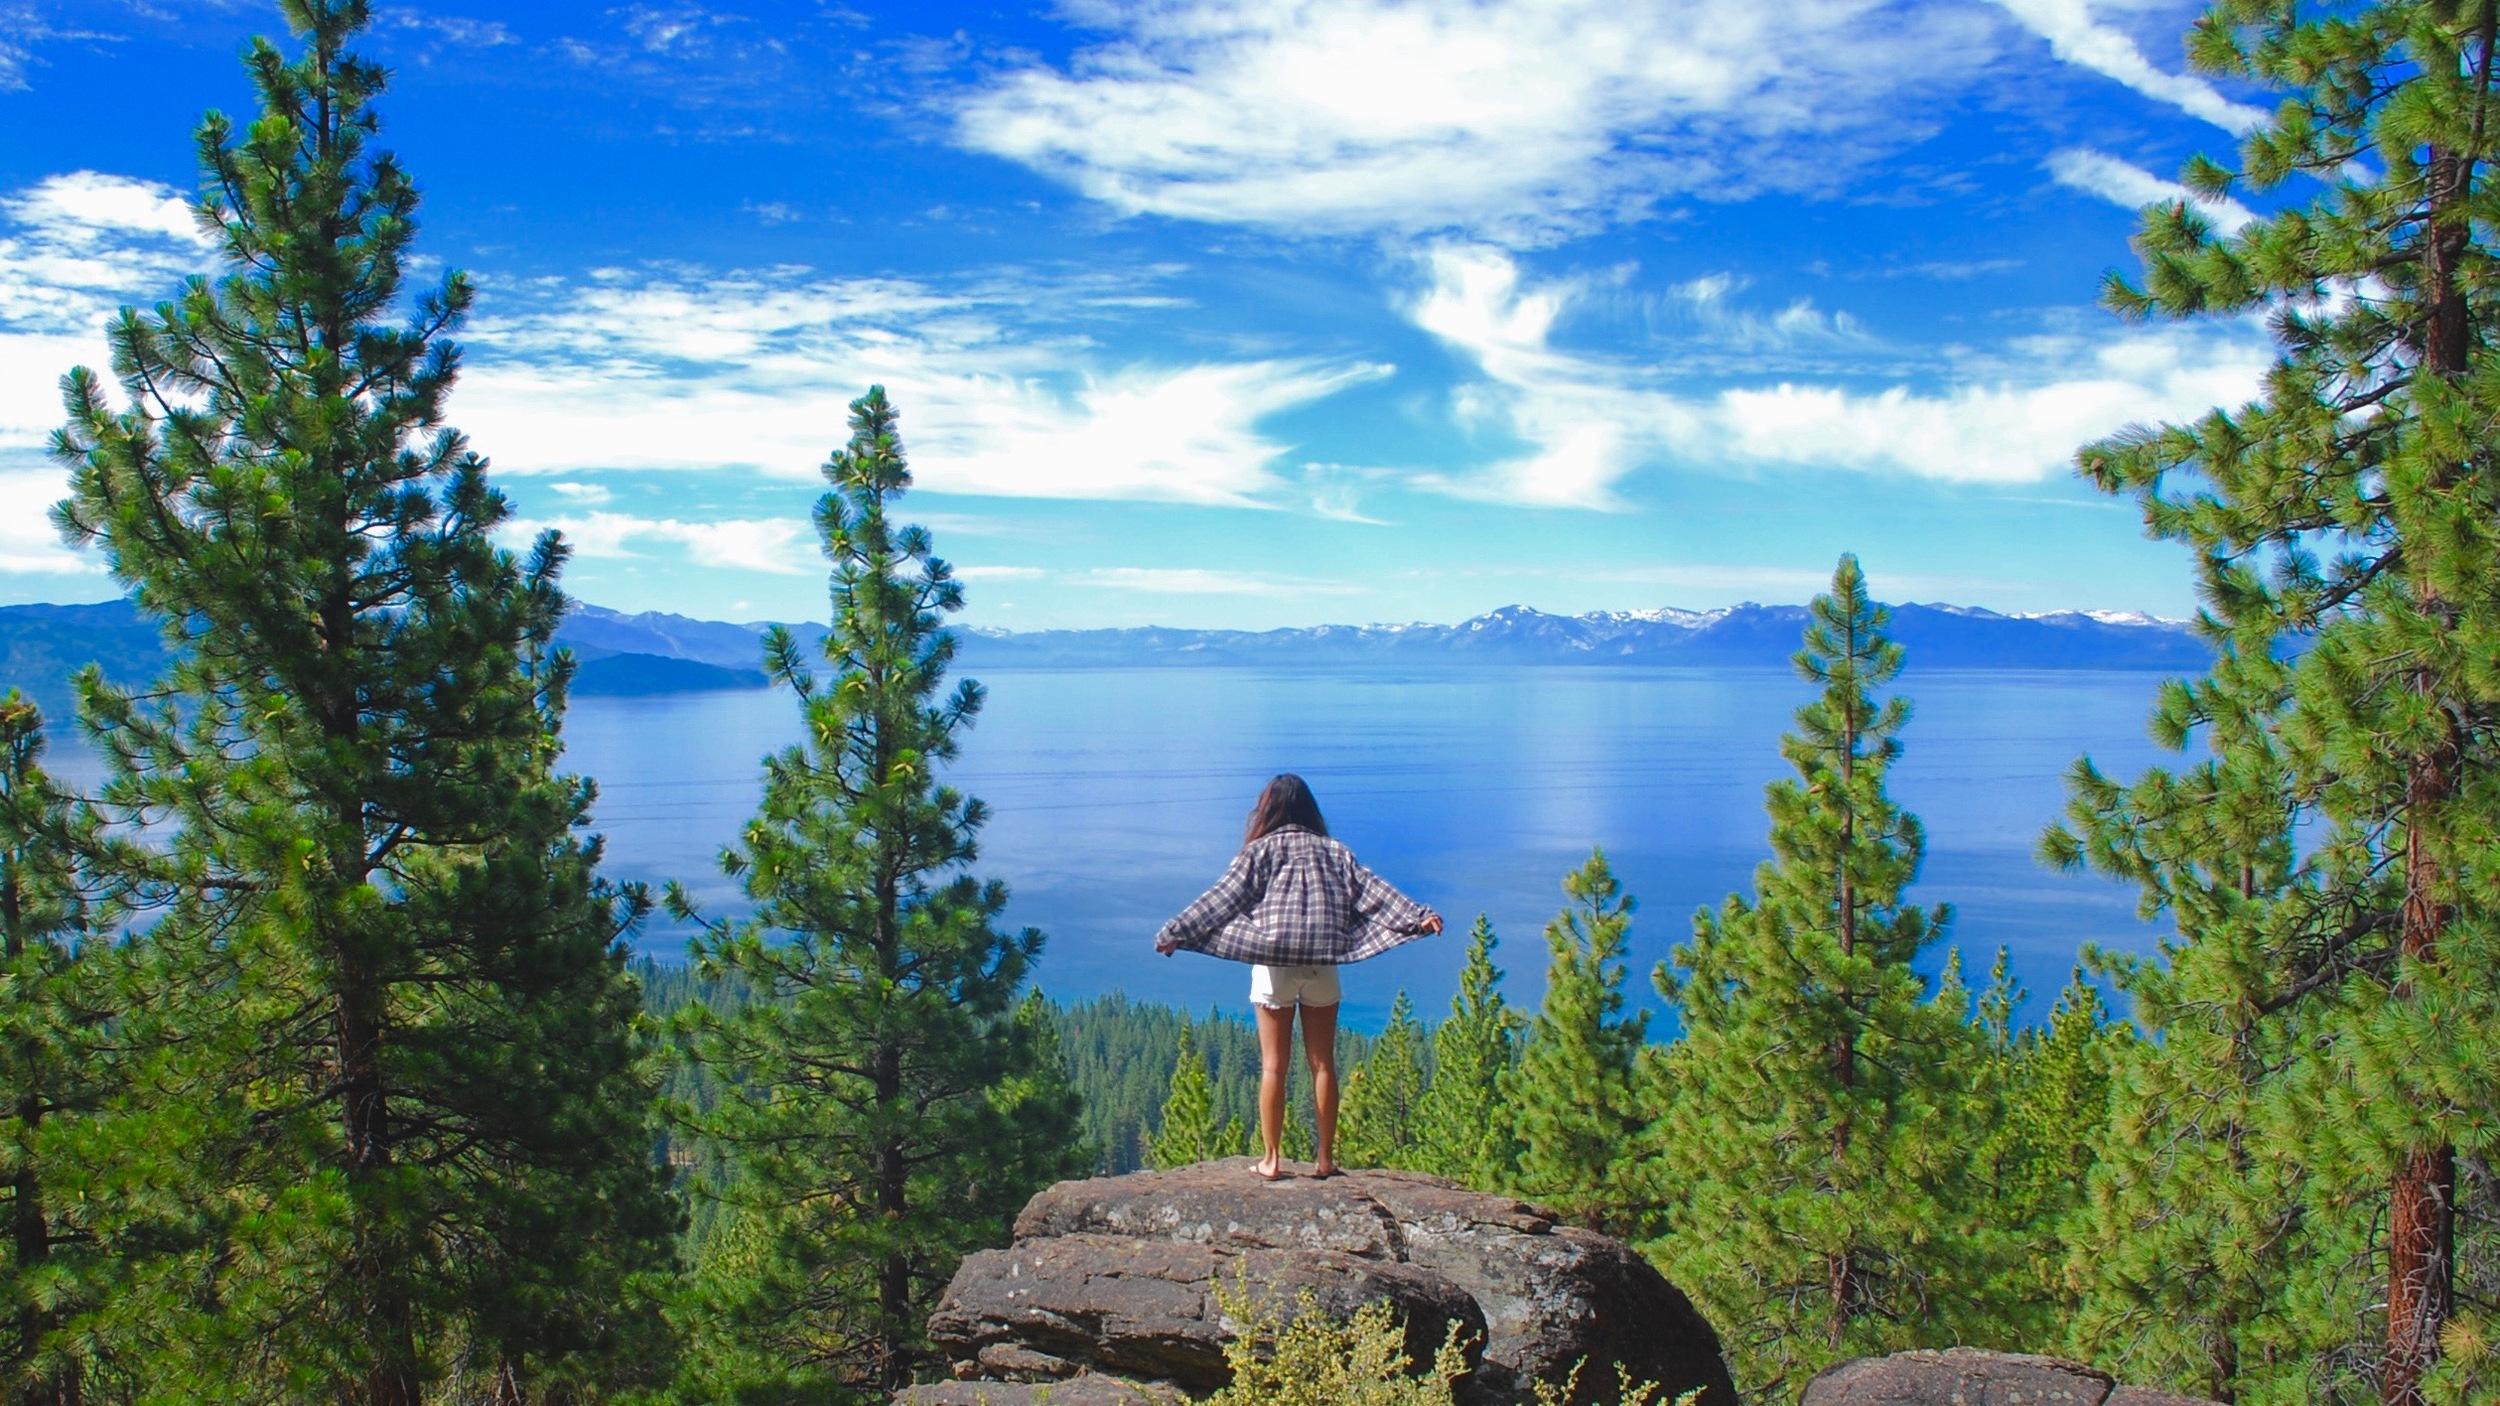 Summer Days in Lake Tahoe, Nevada